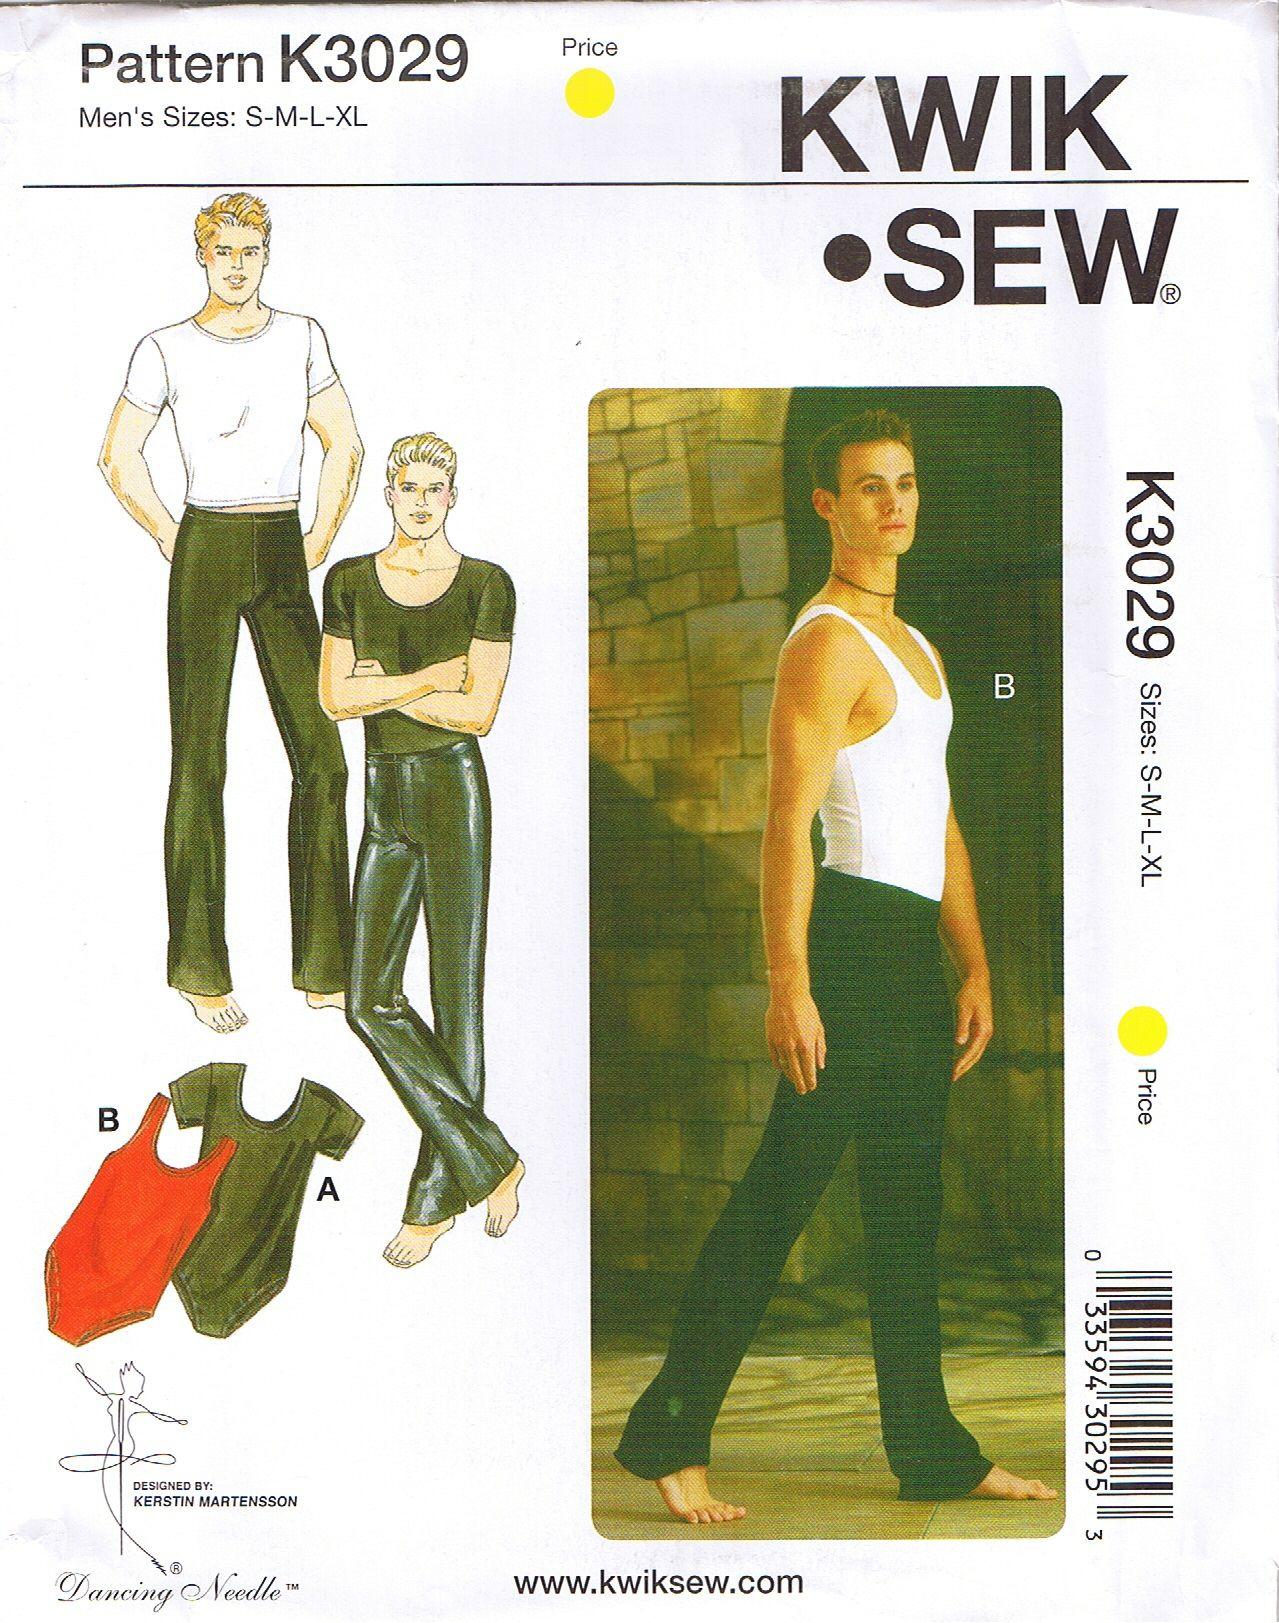 Mens dance wear pants t shirt leotard kwik sew sewing pattern sz kwik sew 3029 mens dance wear sewing pattern available for sale in my ebay store jeuxipadfo Choice Image